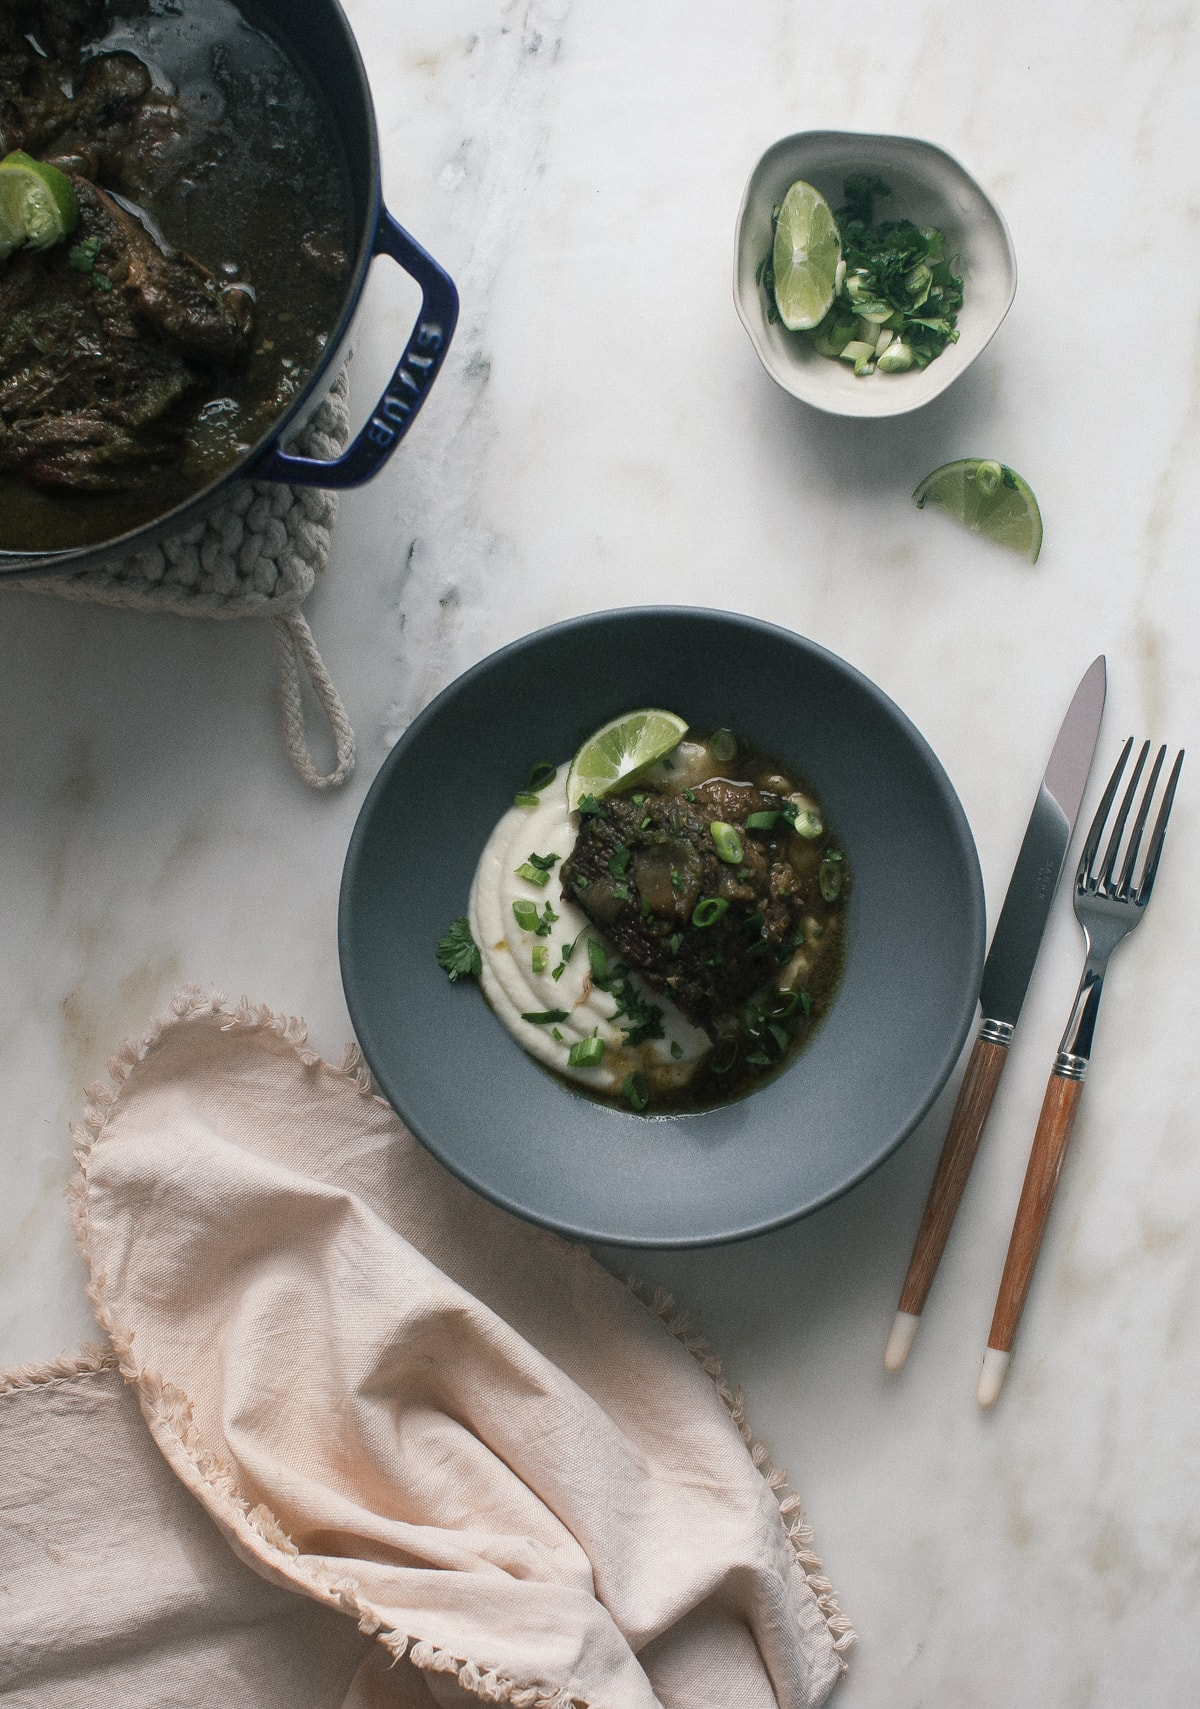 Peruvian-ish Pot Roast with Silky Smooth Cauliflower Puree